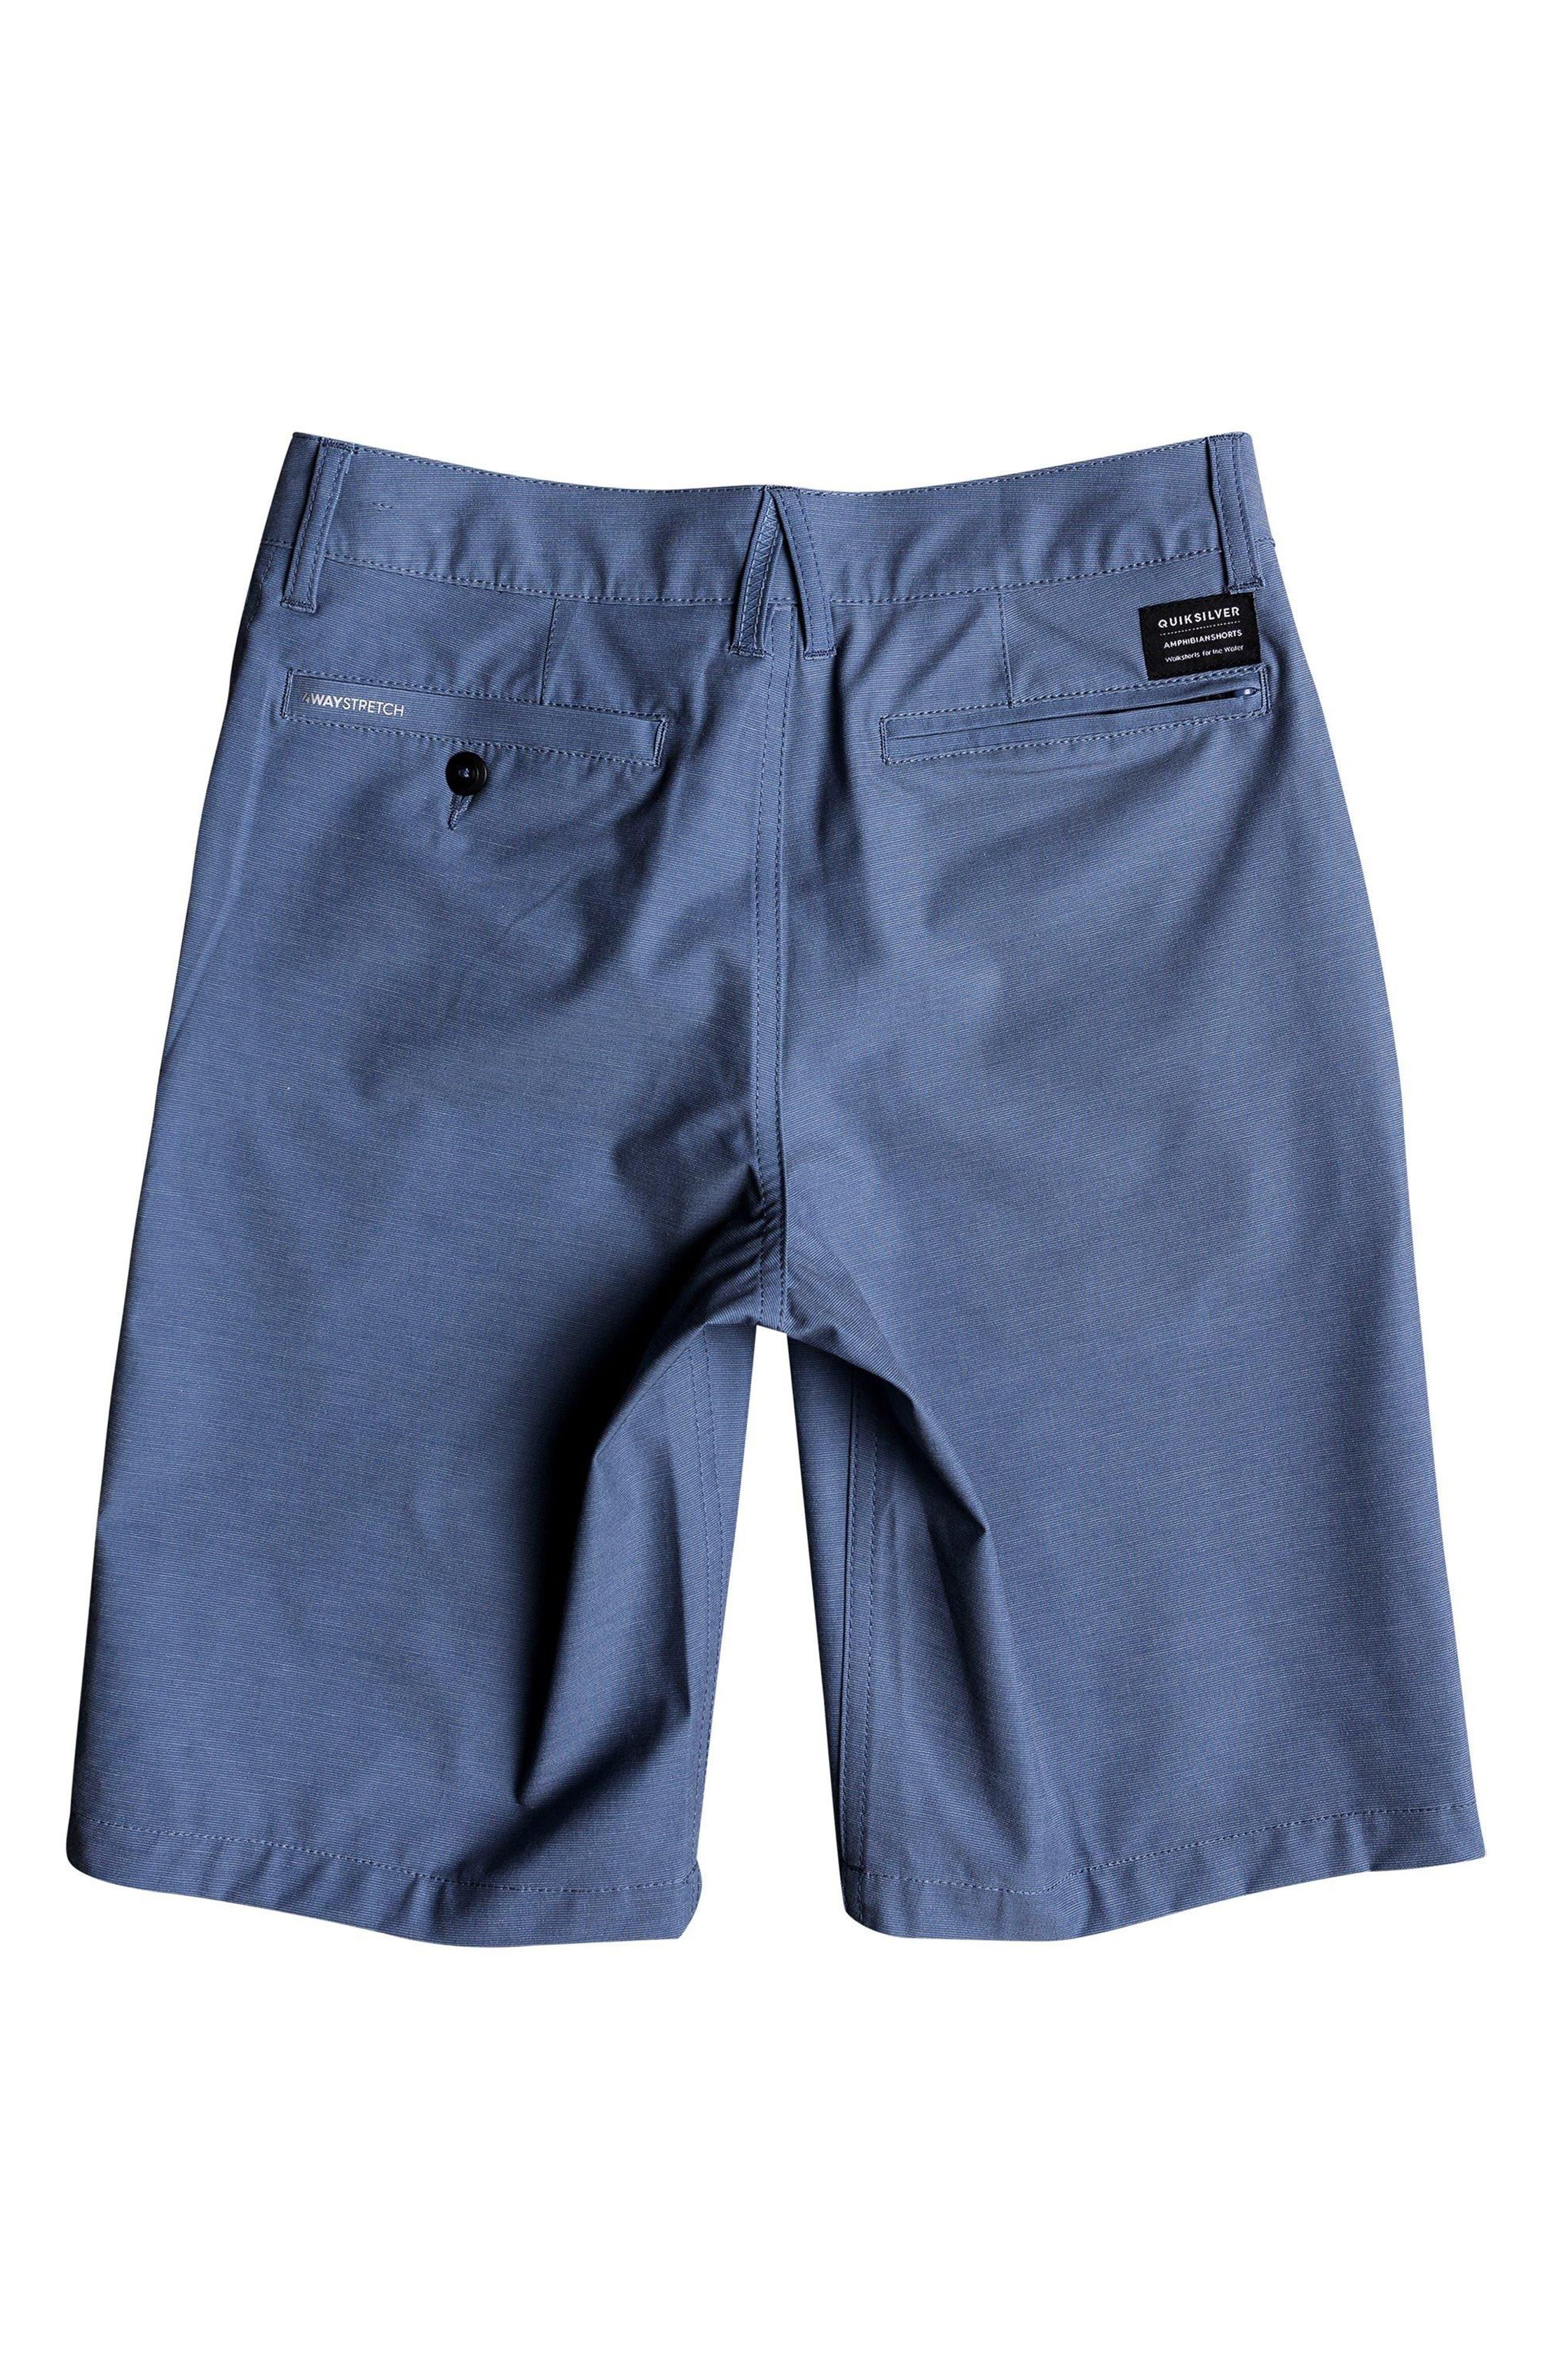 QUIKSILVER, Union Heather Amphibian Hybrid Shorts, Alternate thumbnail 2, color, BIJOU BLUE